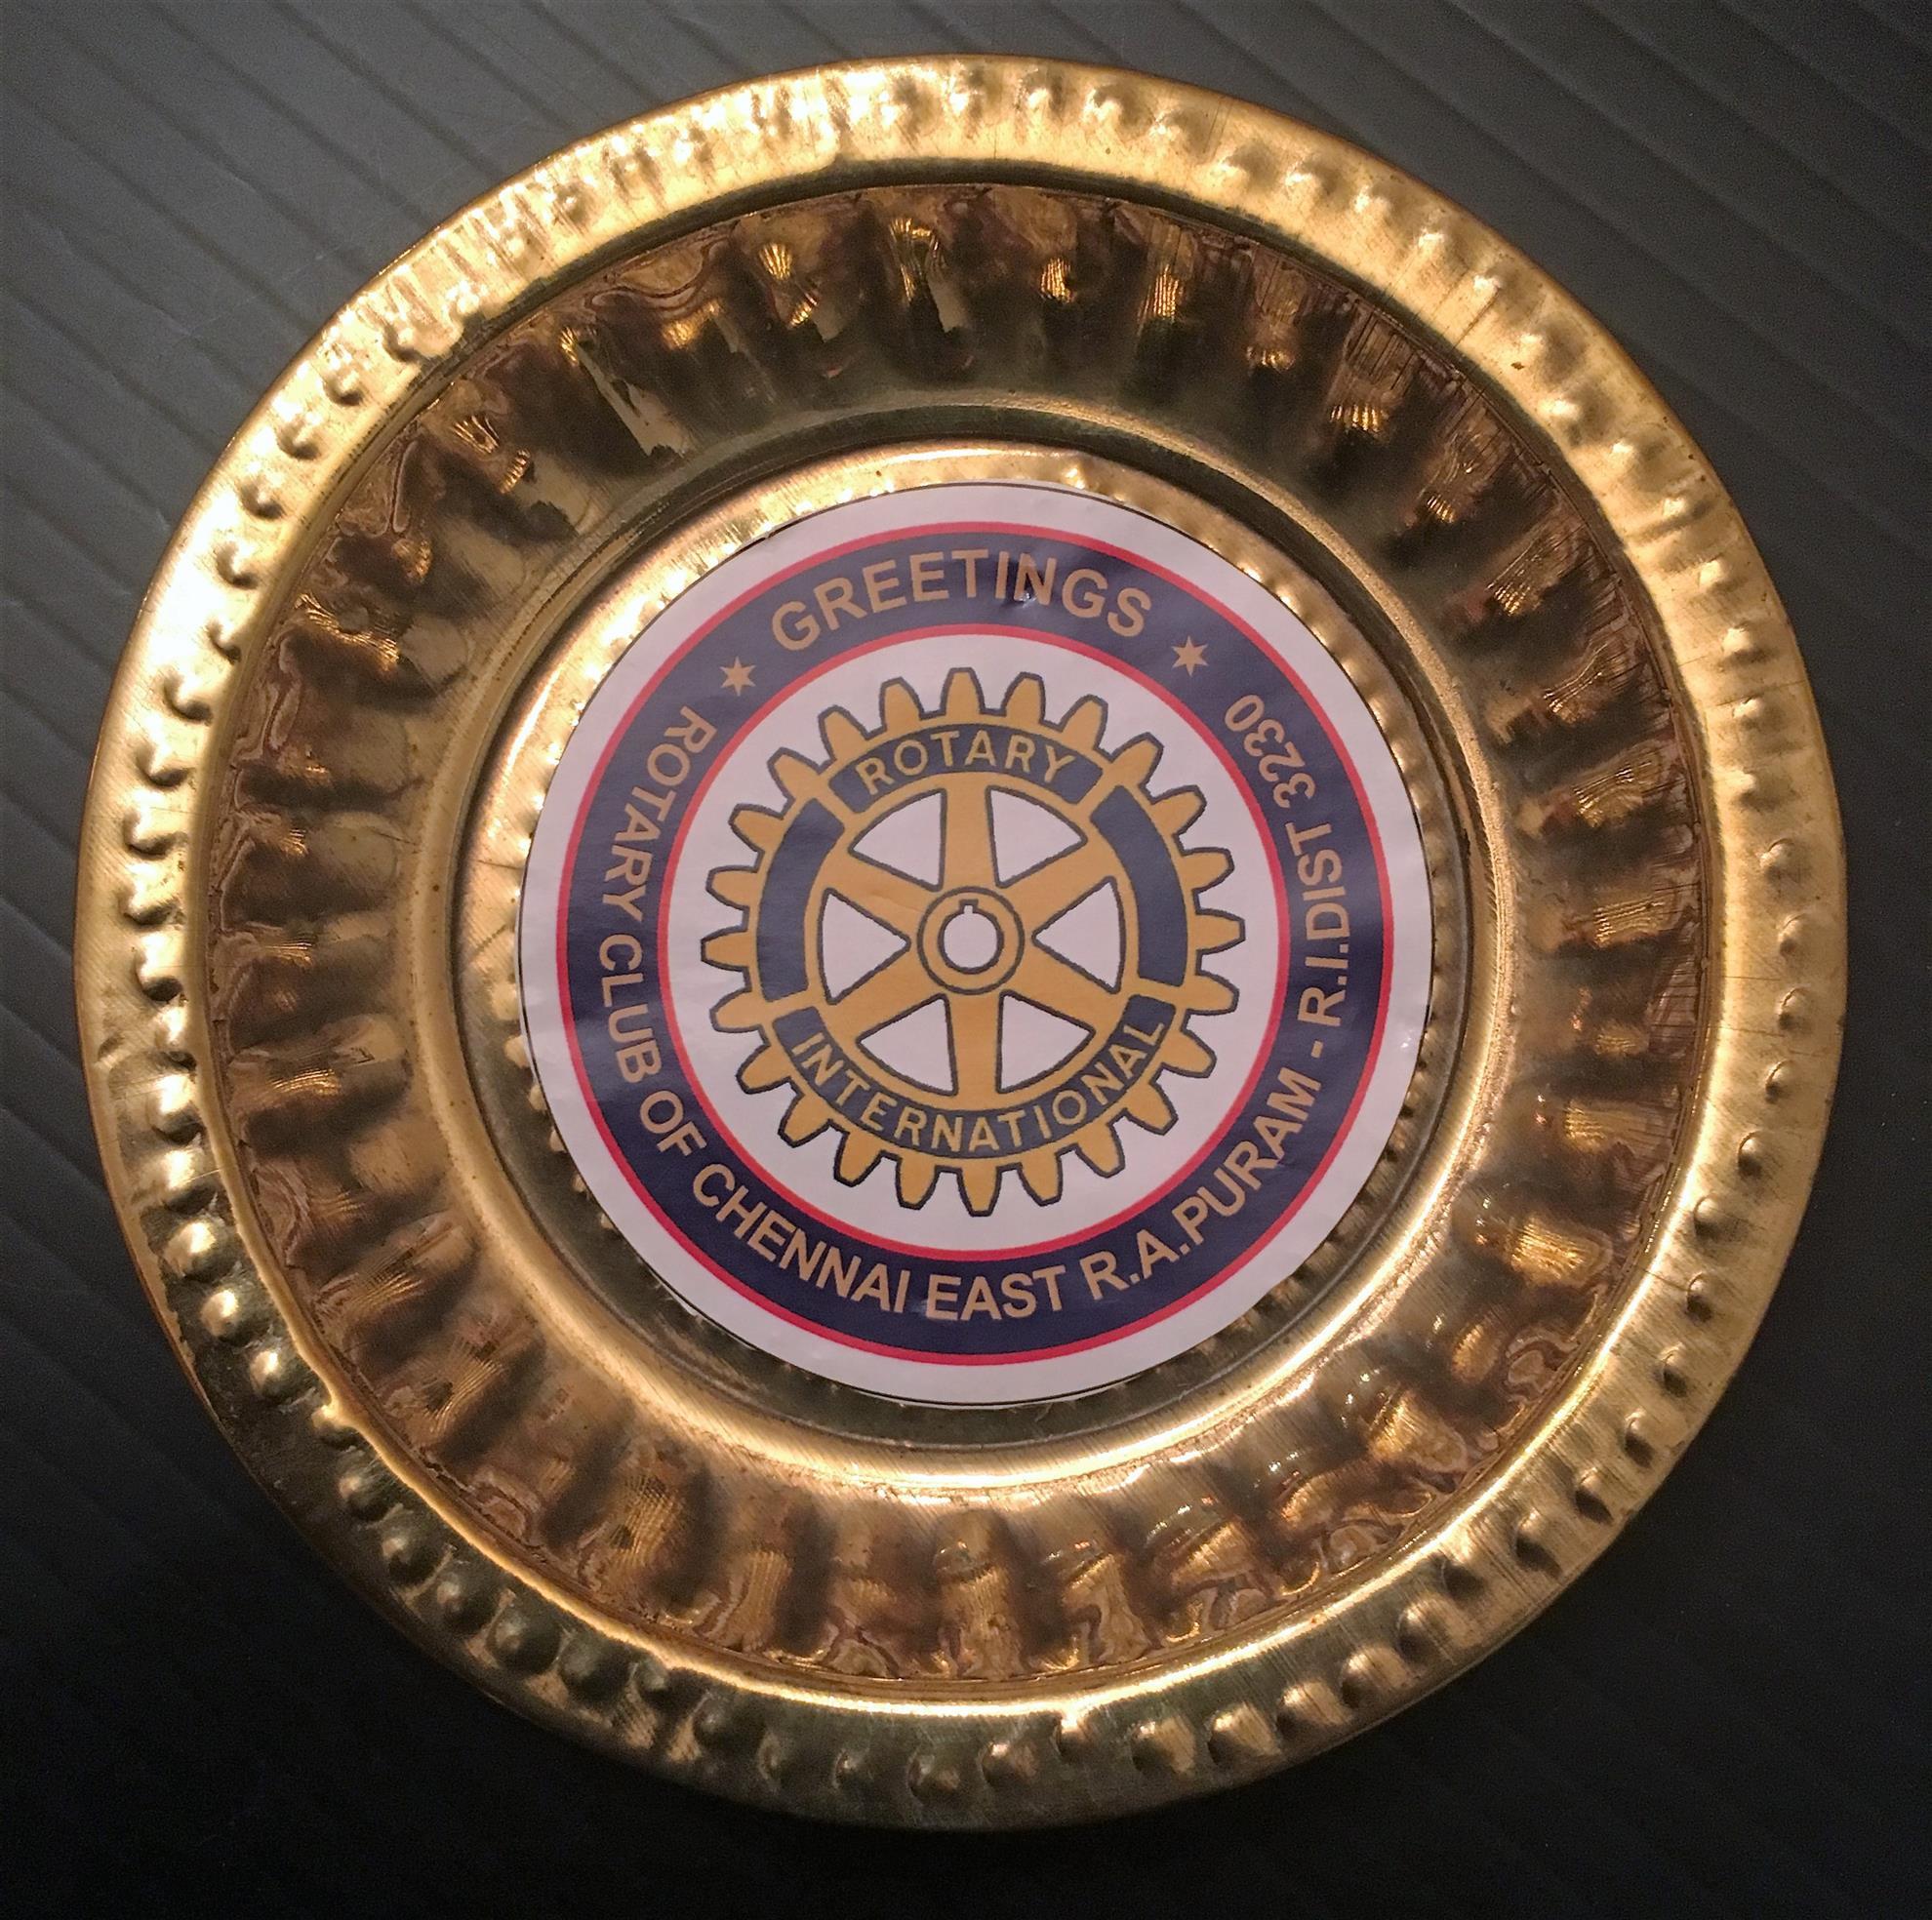 2017 05 04 Memento from Chennai, India